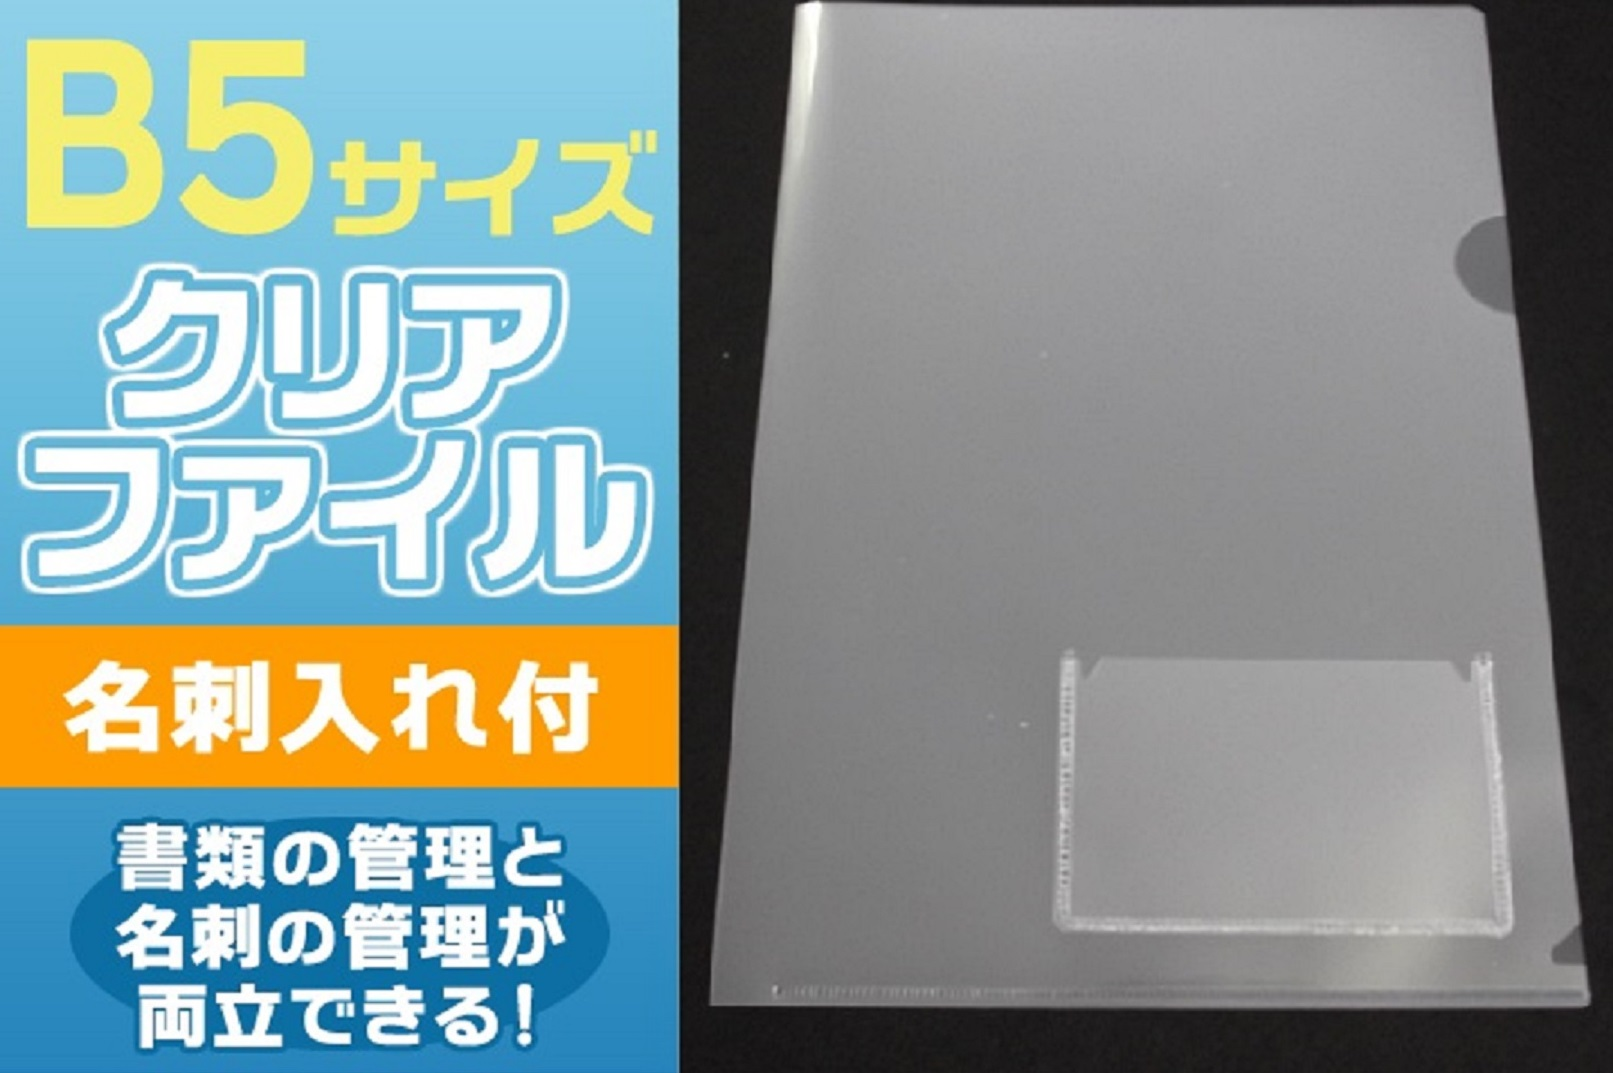 B5サイズ・名刺入付クリアファイル(クリアホルダー)画像